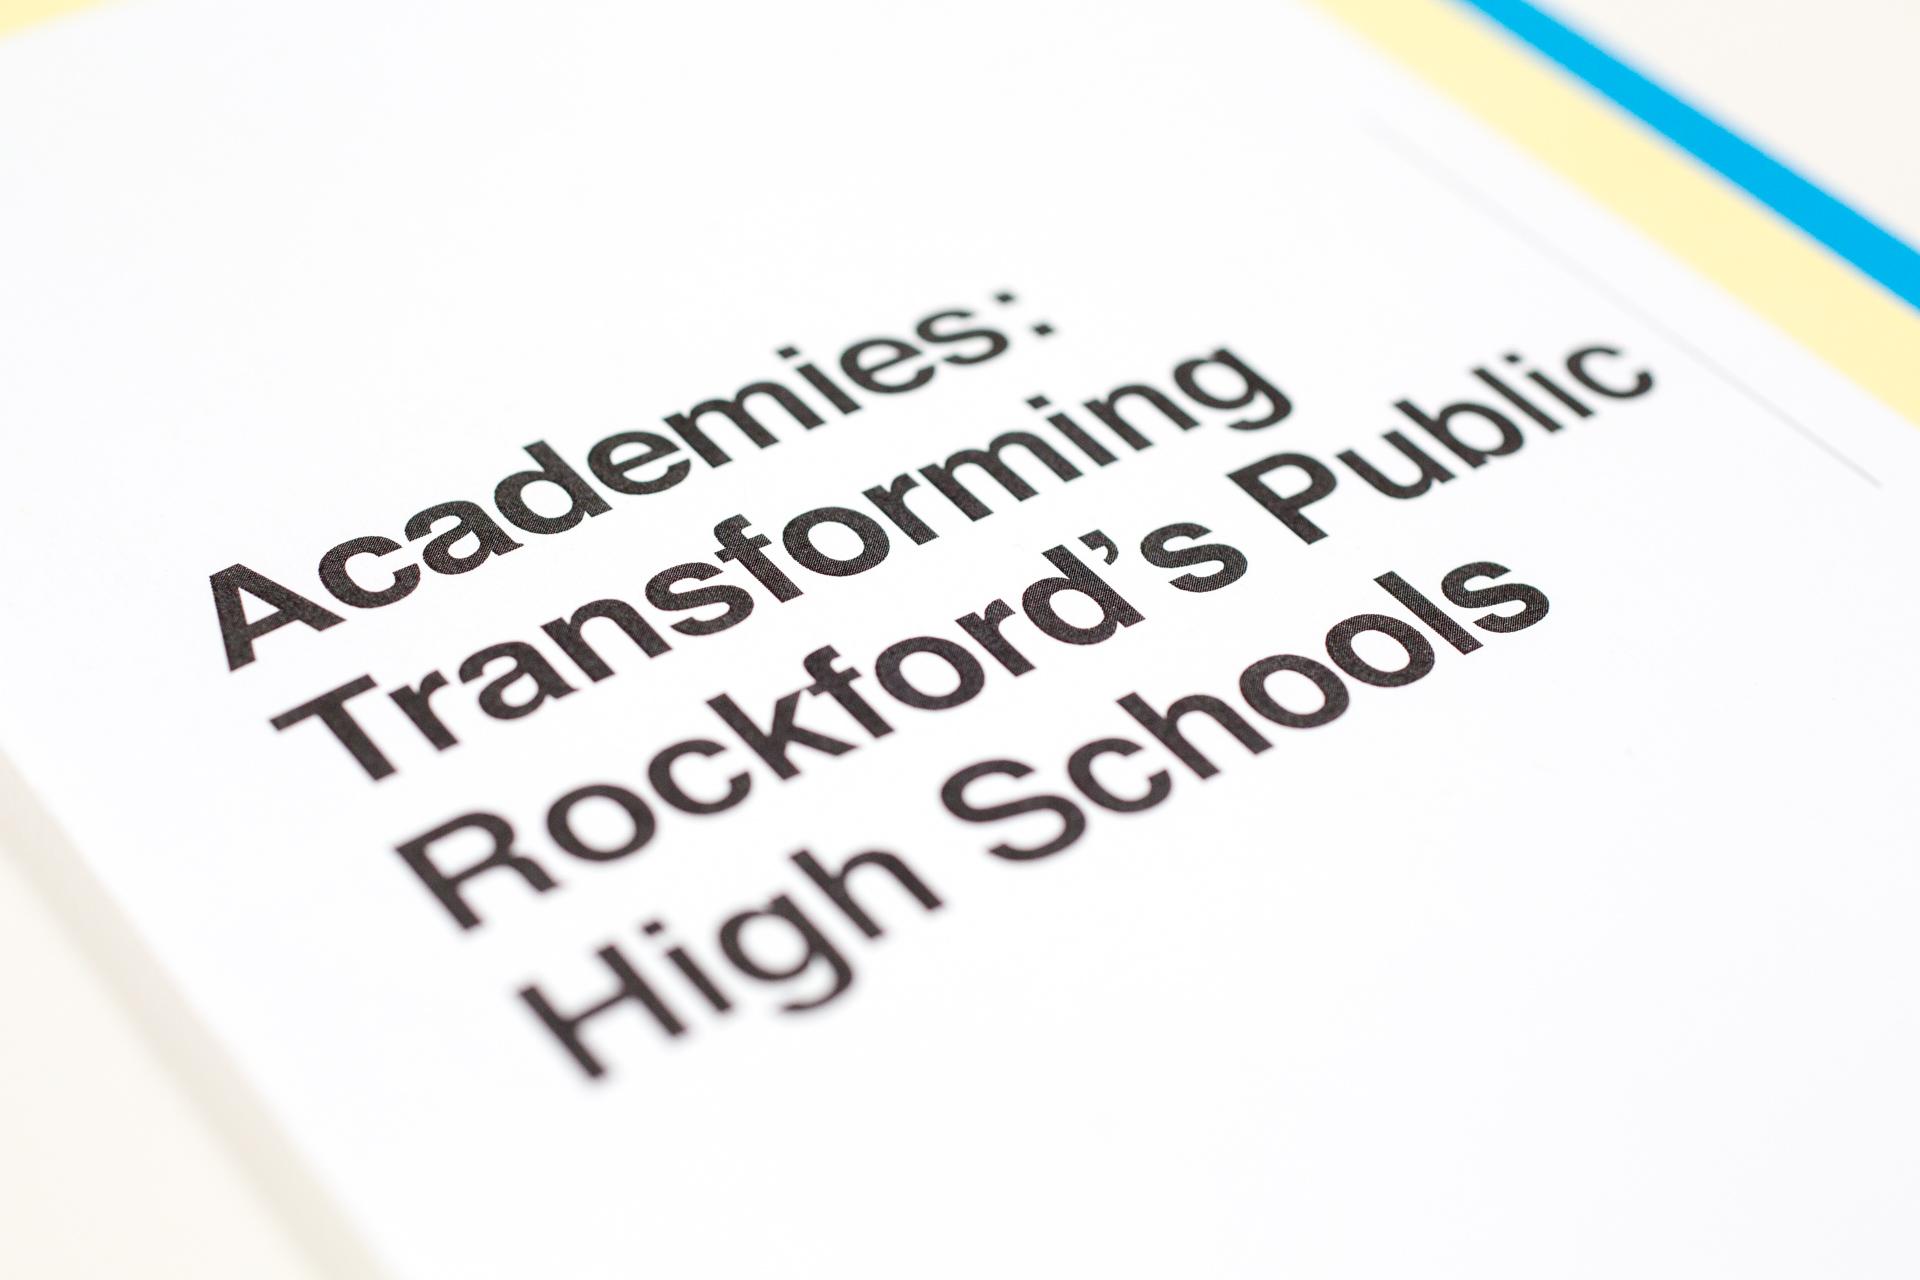 Alignment Rockford: Rockford High School Academies